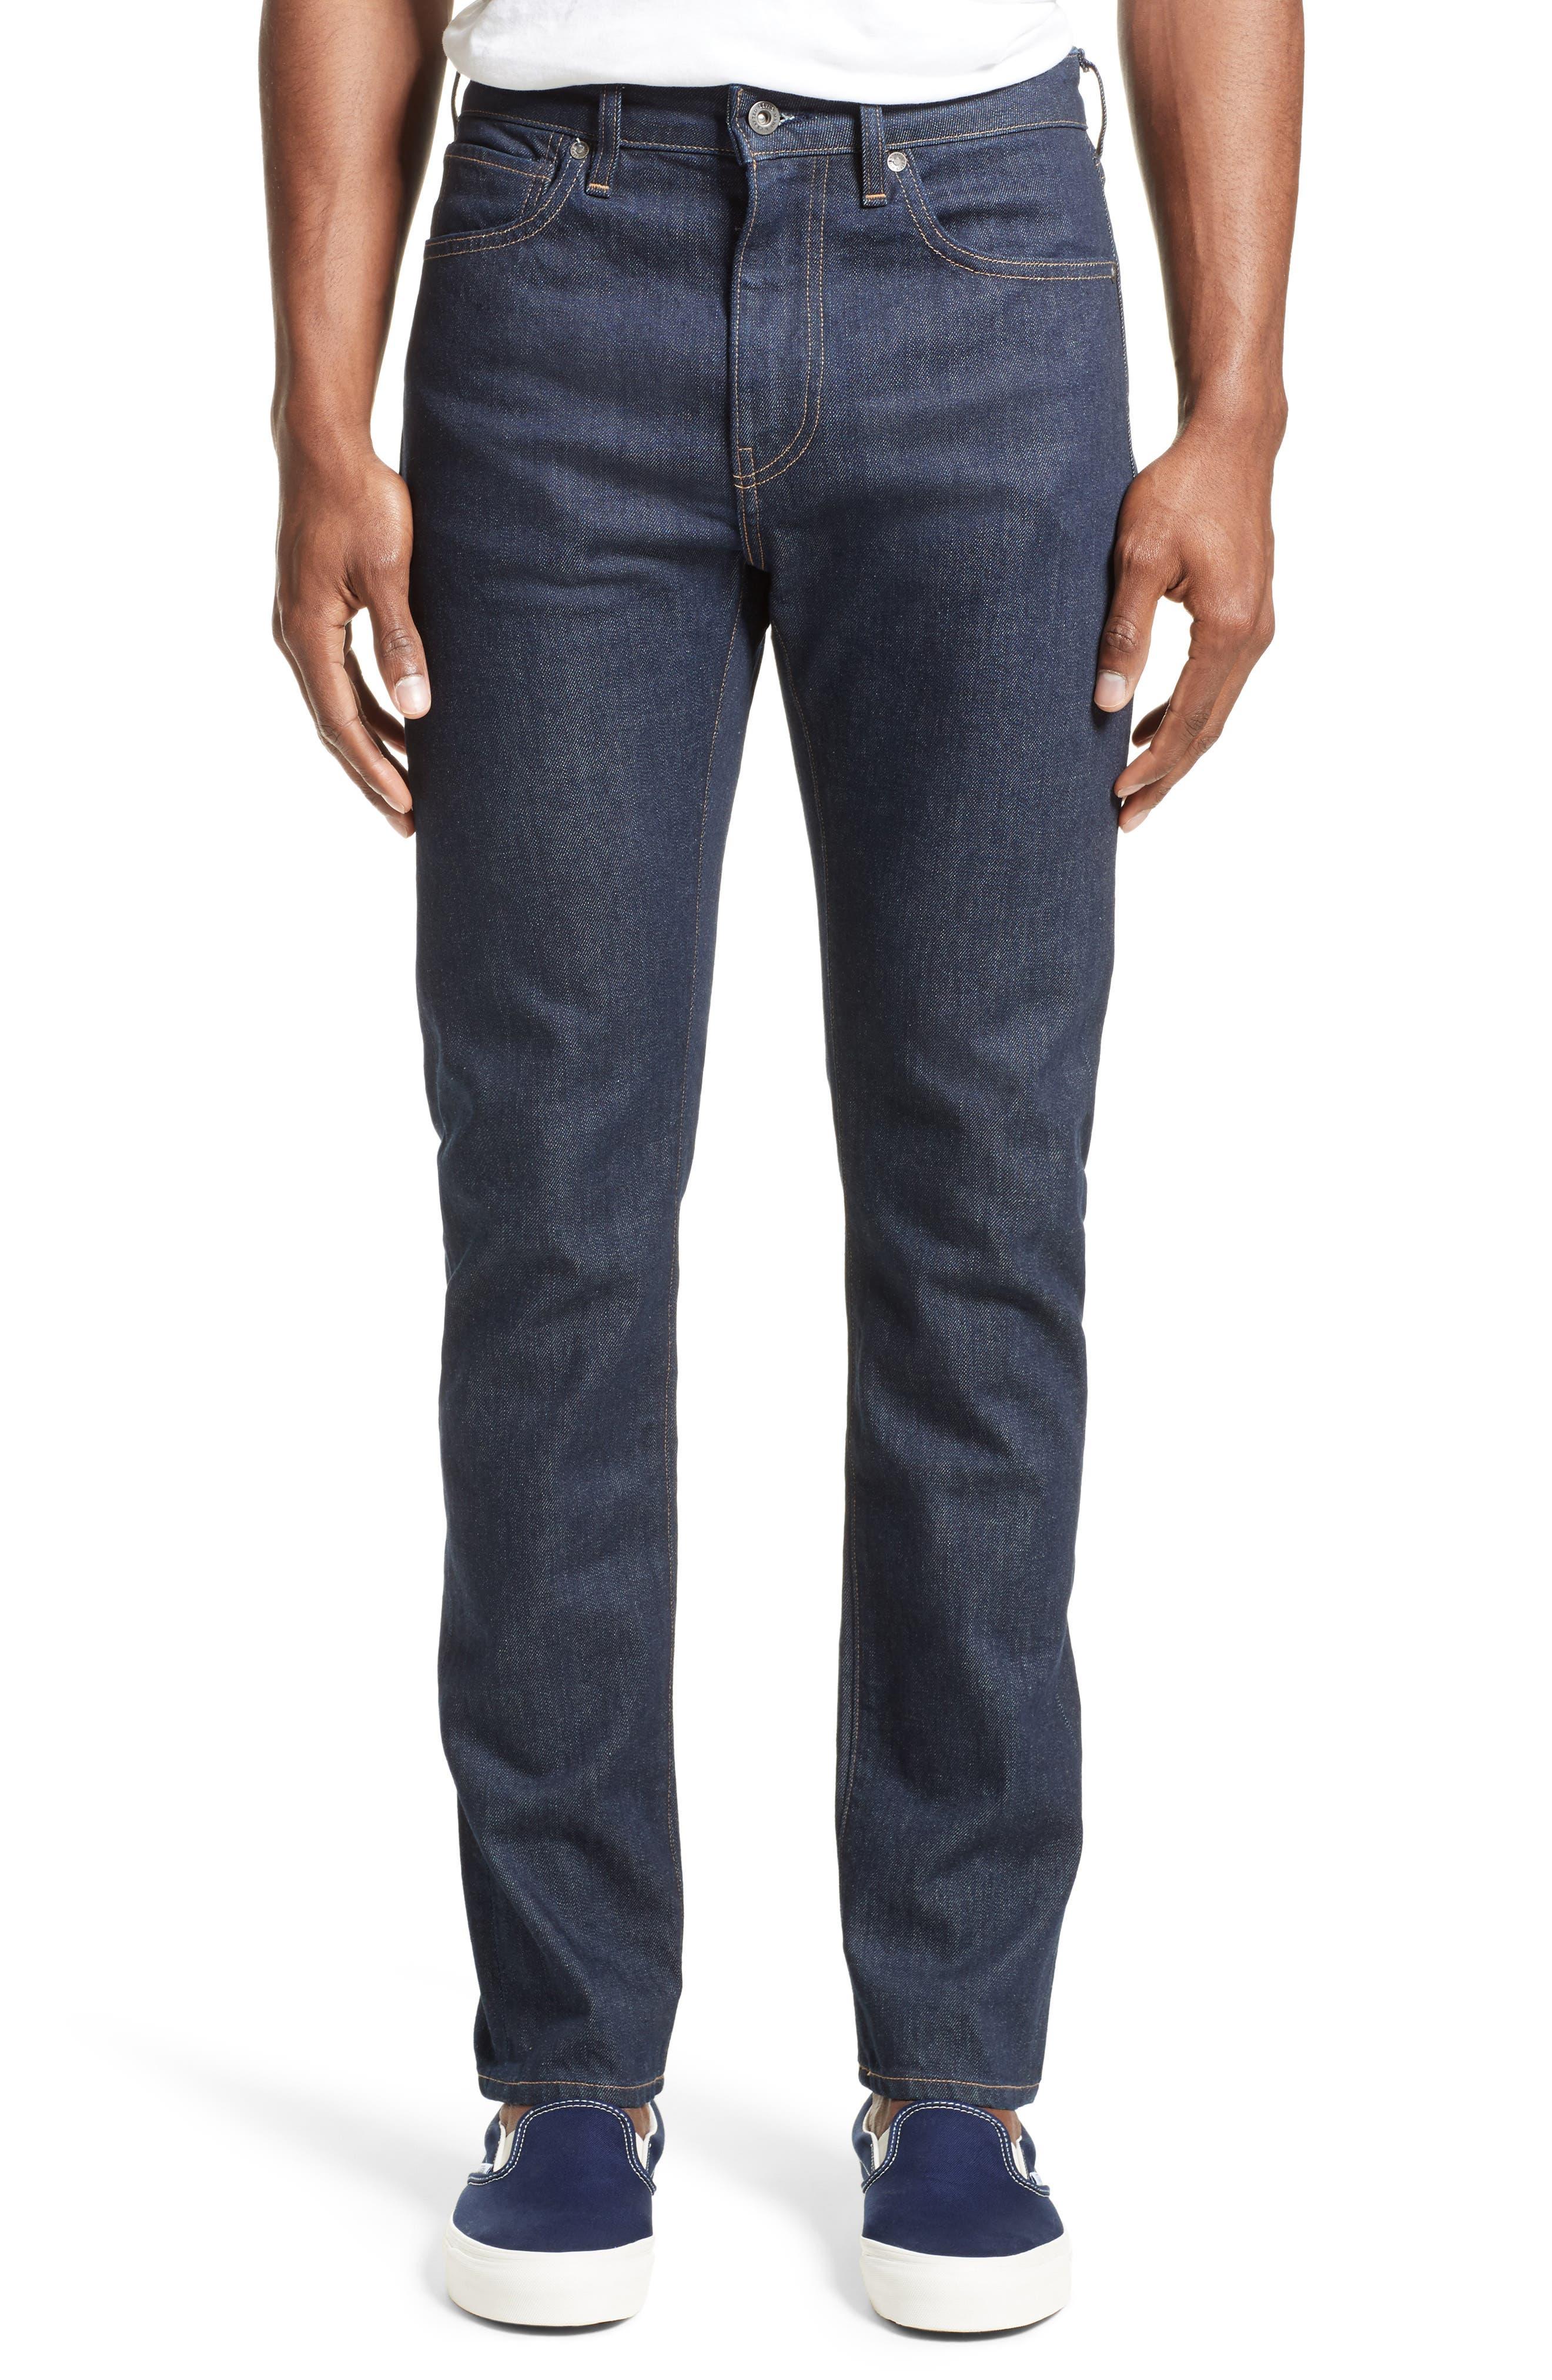 Tack Slim Fit Jeans,                             Main thumbnail 1, color,                             Dark Blue